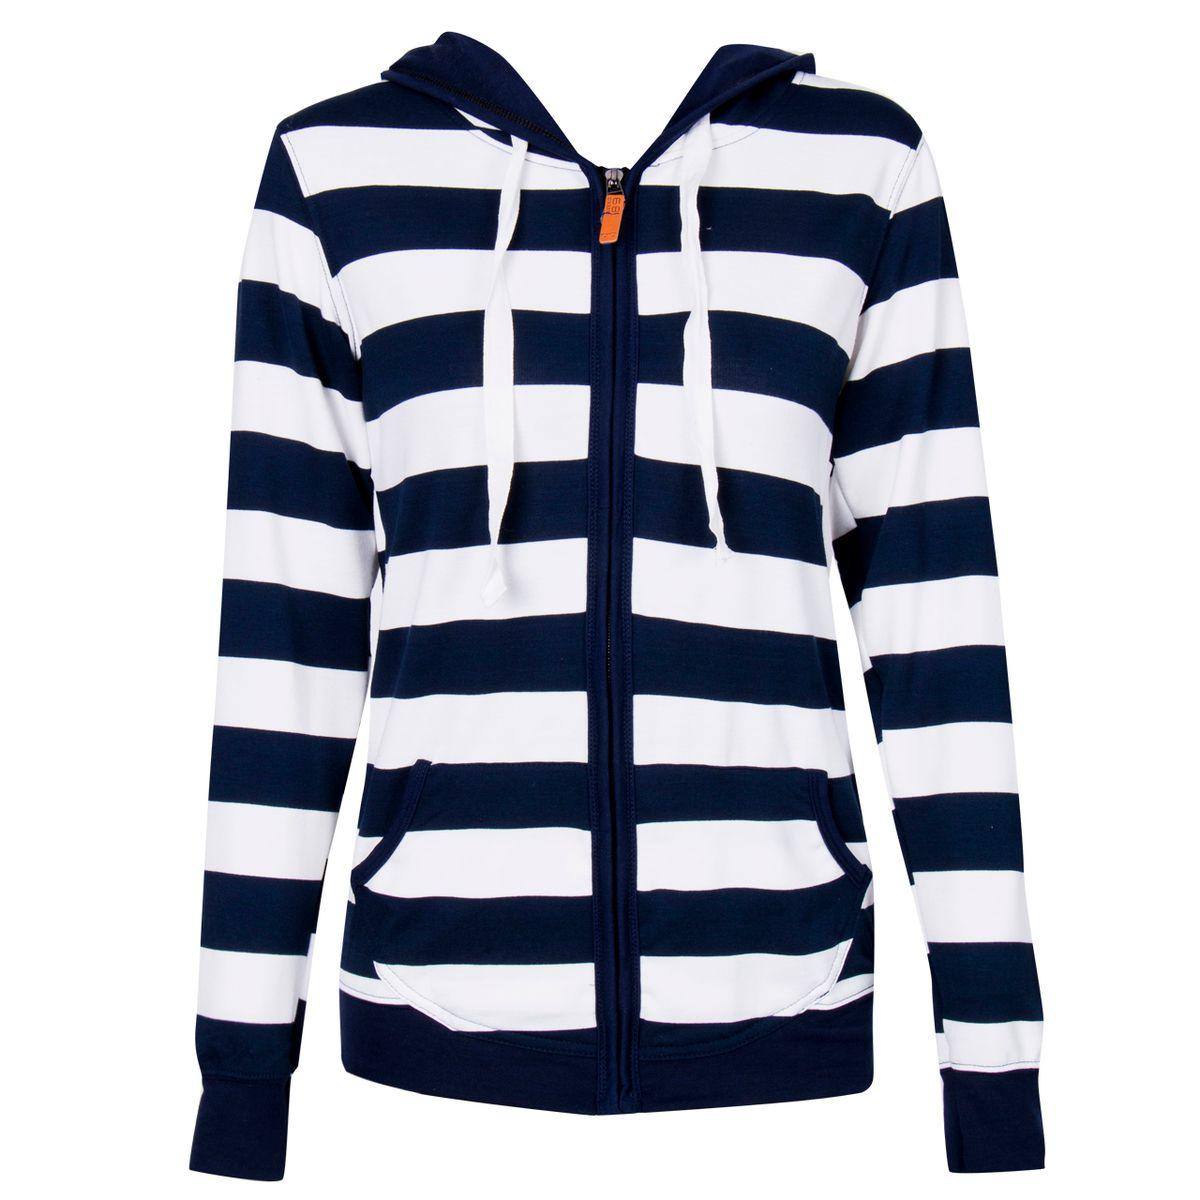 Hoodies & Sweatshirts Hirigin Newest 2018 Women Animal Print Coat Hoodie Sweatshirt Jumper Fashion Casual Pullover Tops